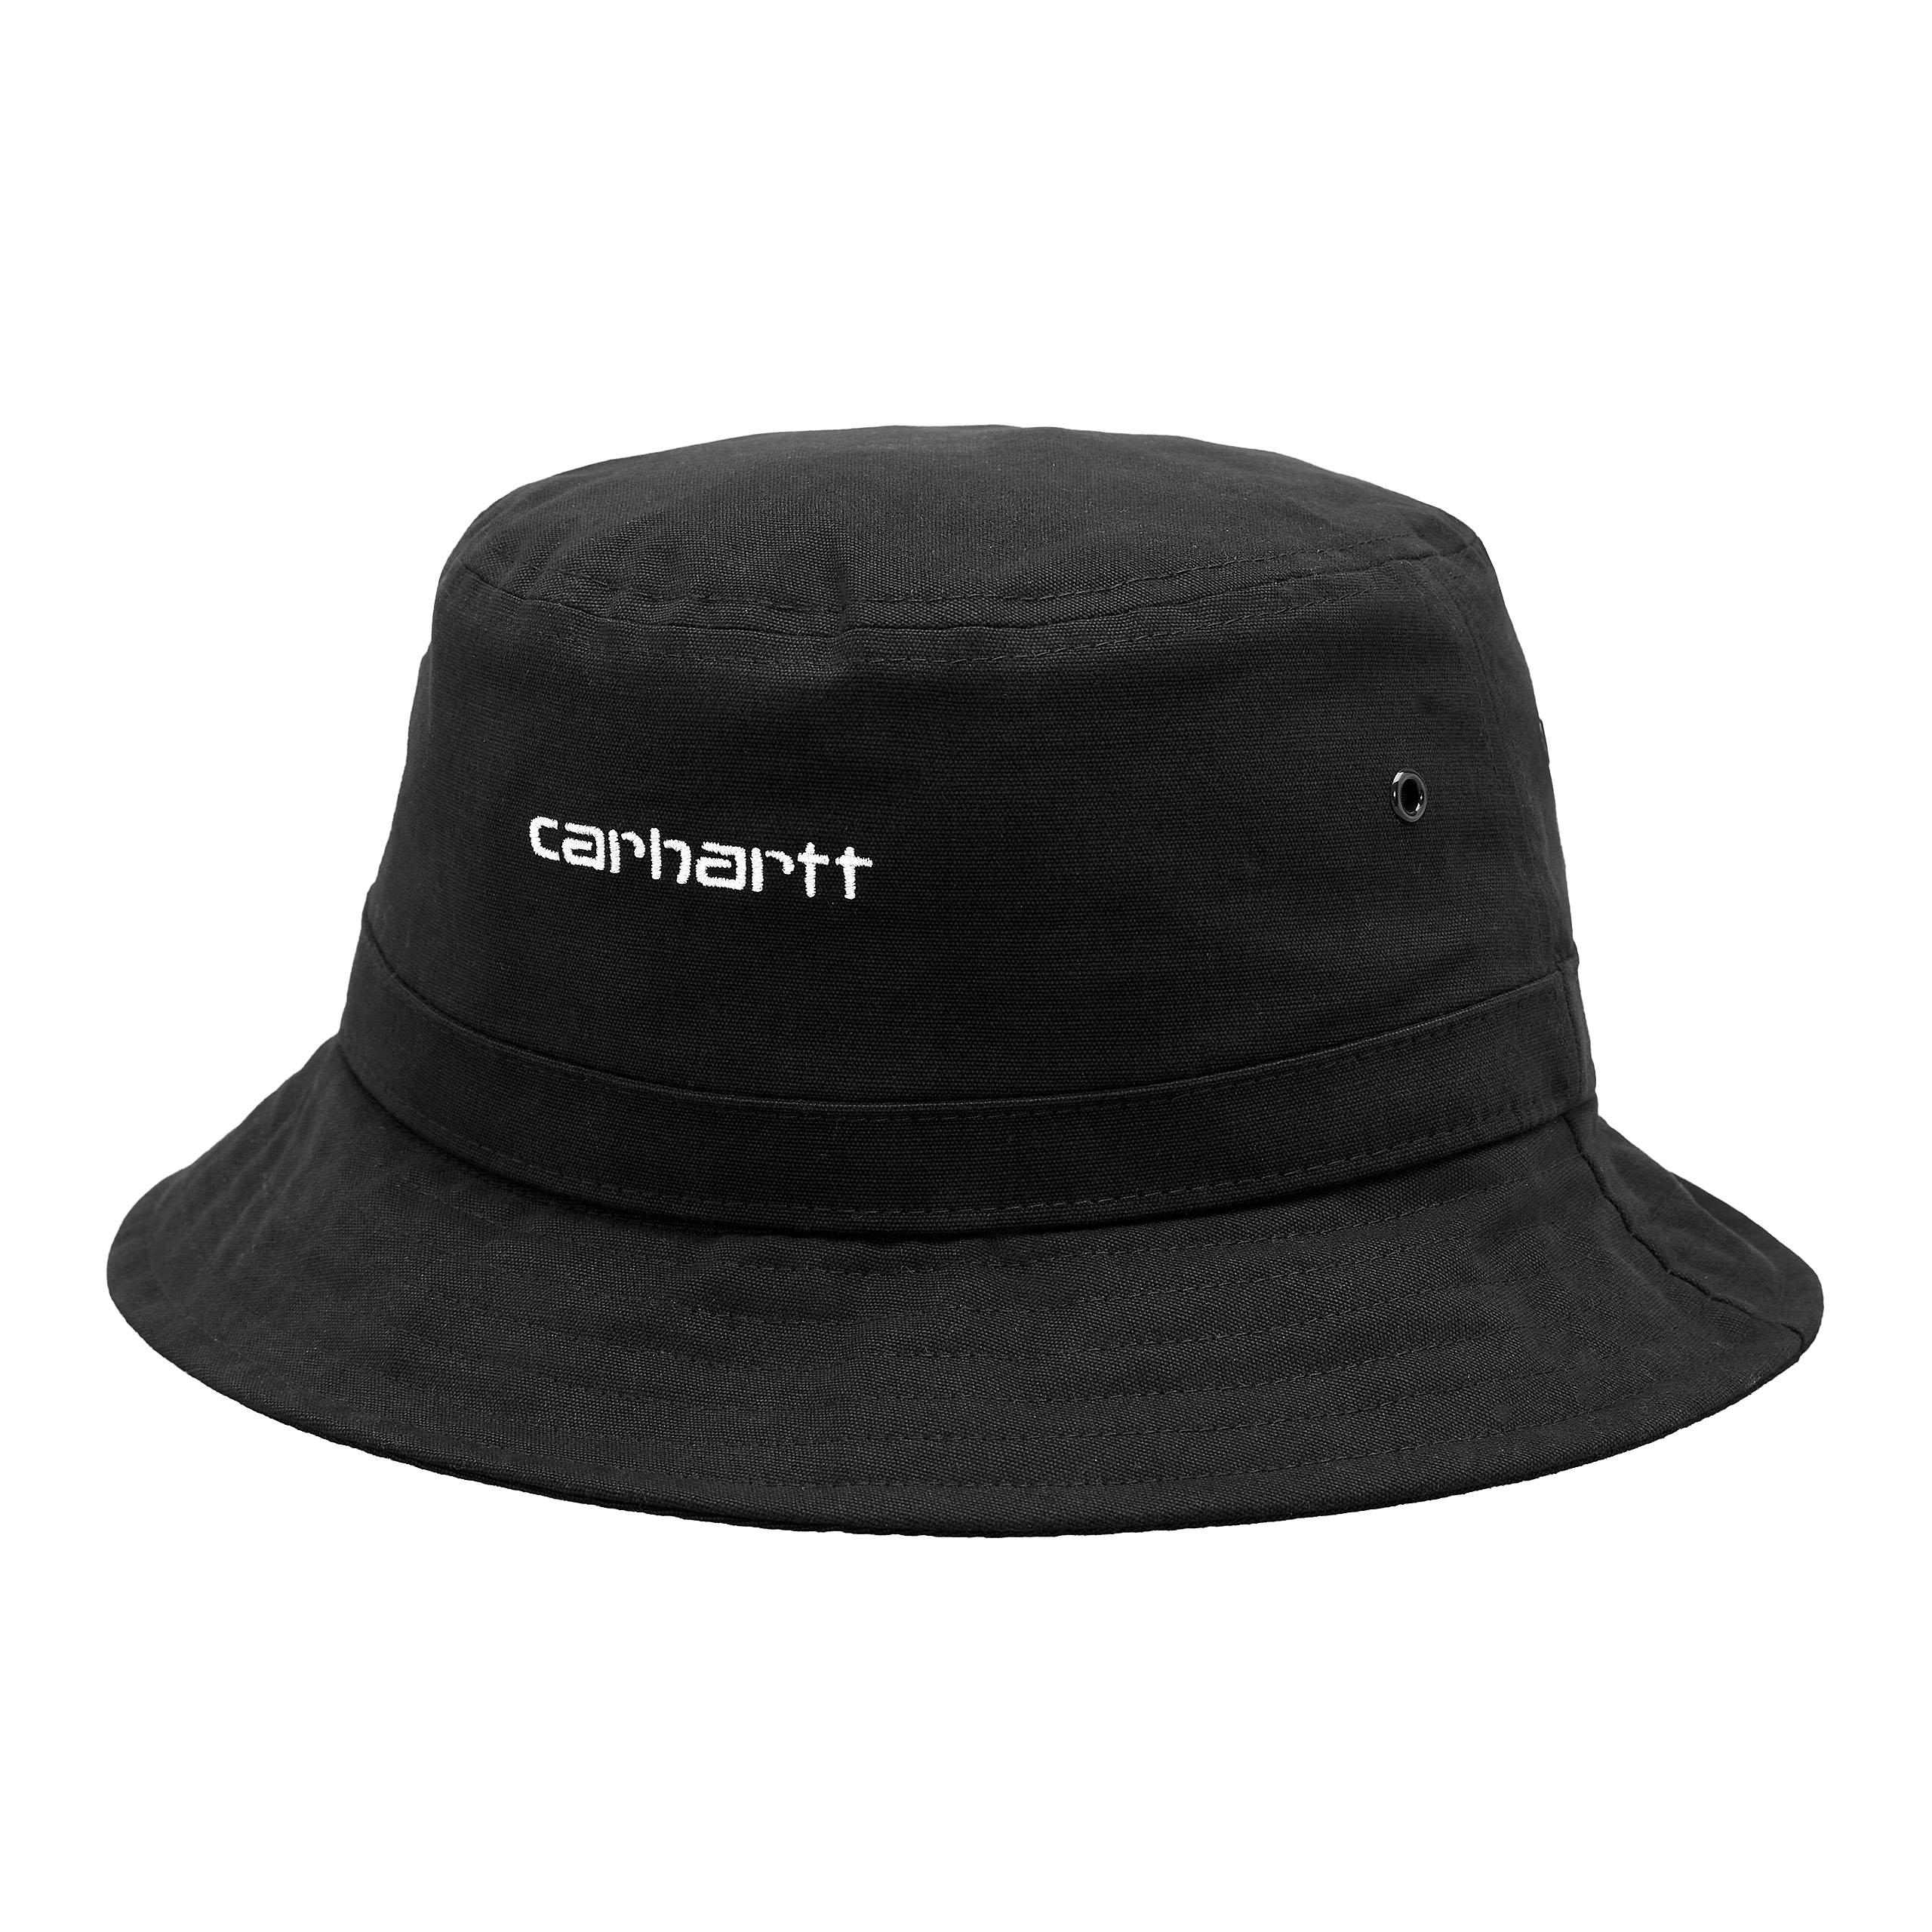 Carhartt WIP - Script Bucket Hat - Black